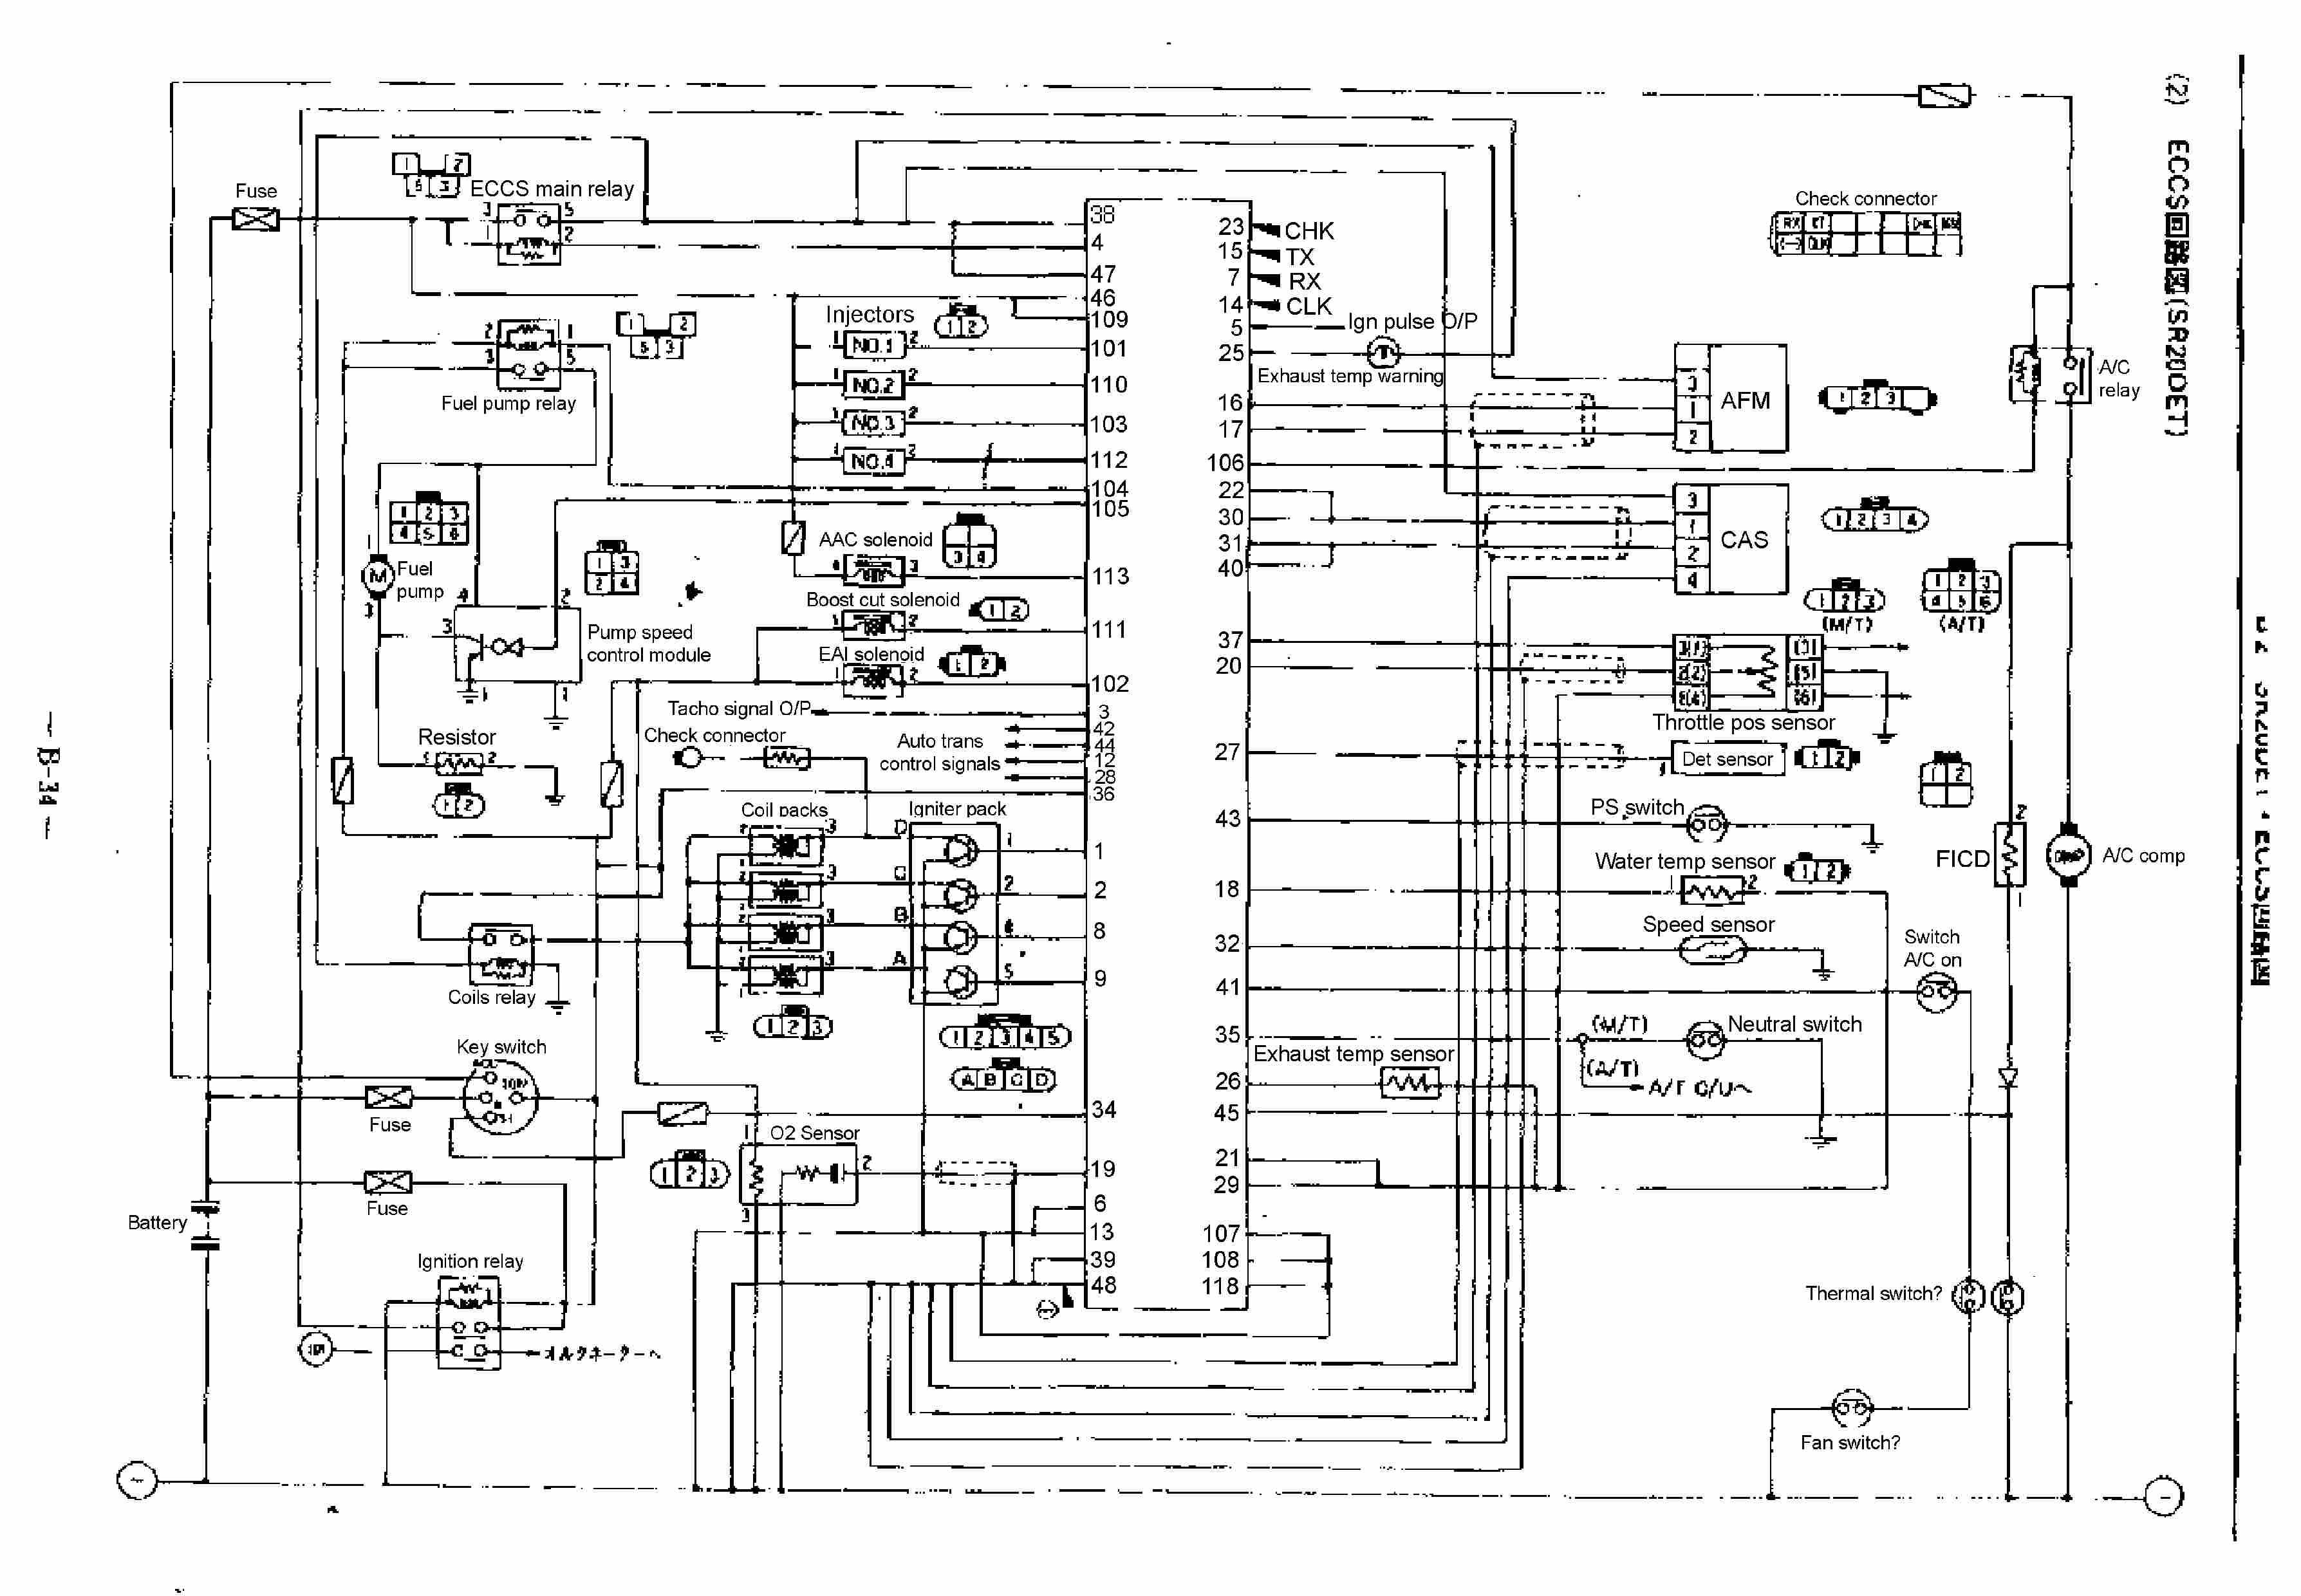 small resolution of bmw e83 engine diagram wiring diagram librarybmw e83 relase hatch switch wiring diagrams simple wiring diagrambmw